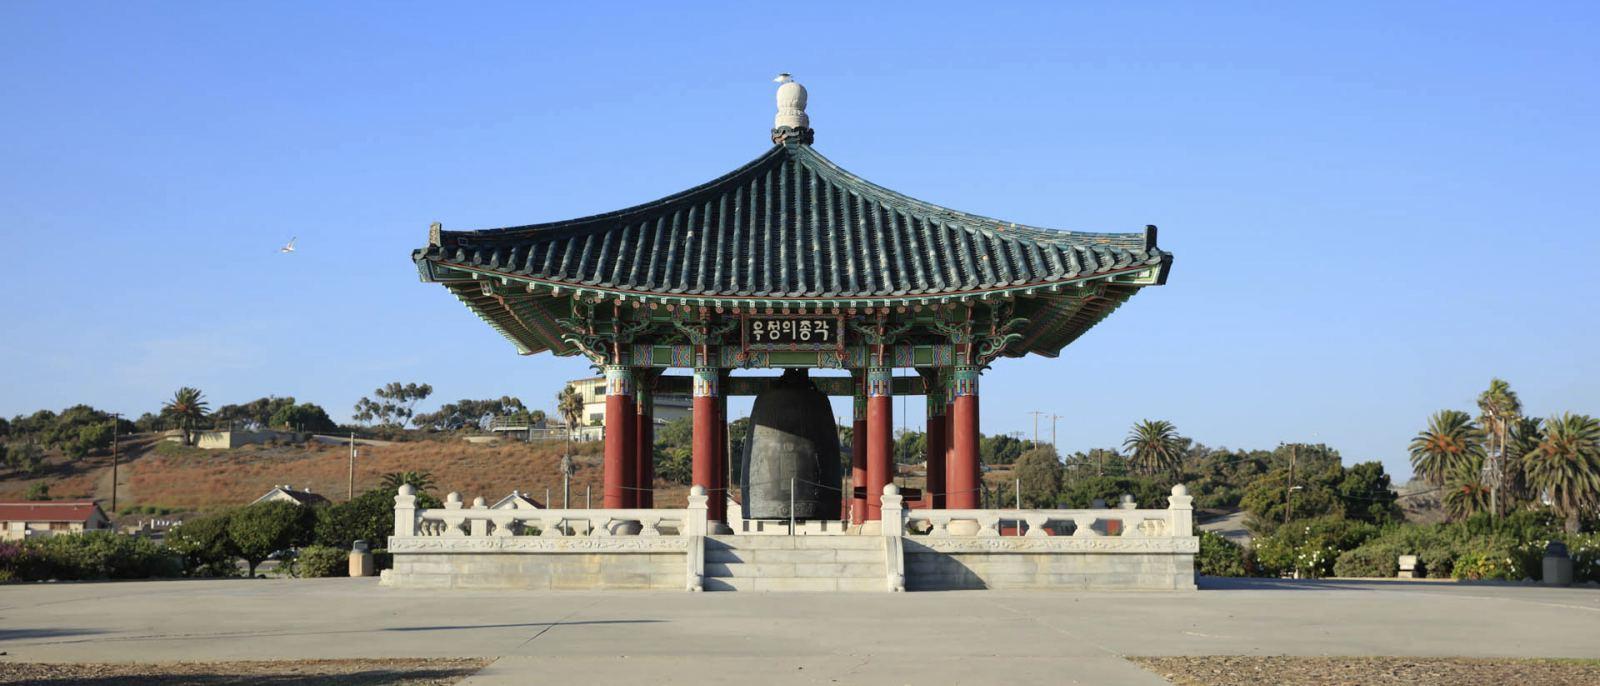 The Korean Bell of Friendship in San Pedro